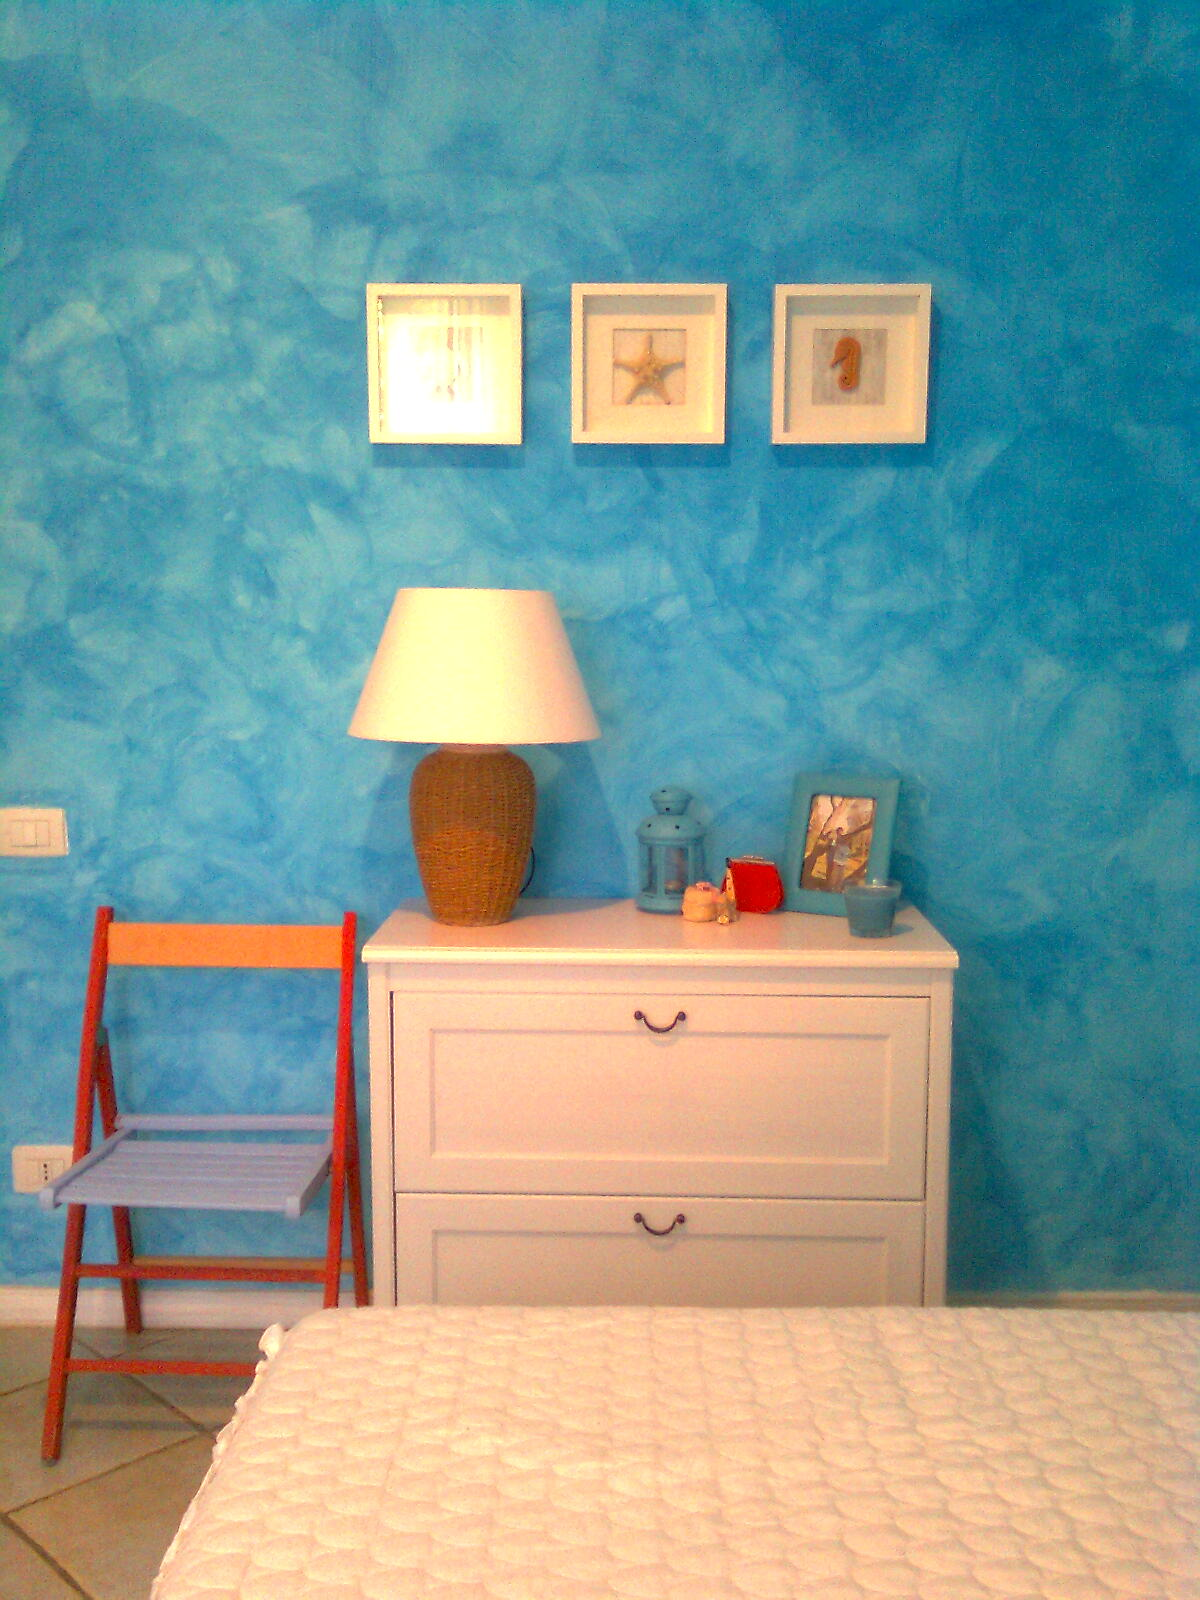 un mare turchese a turquoise sea. Black Bedroom Furniture Sets. Home Design Ideas